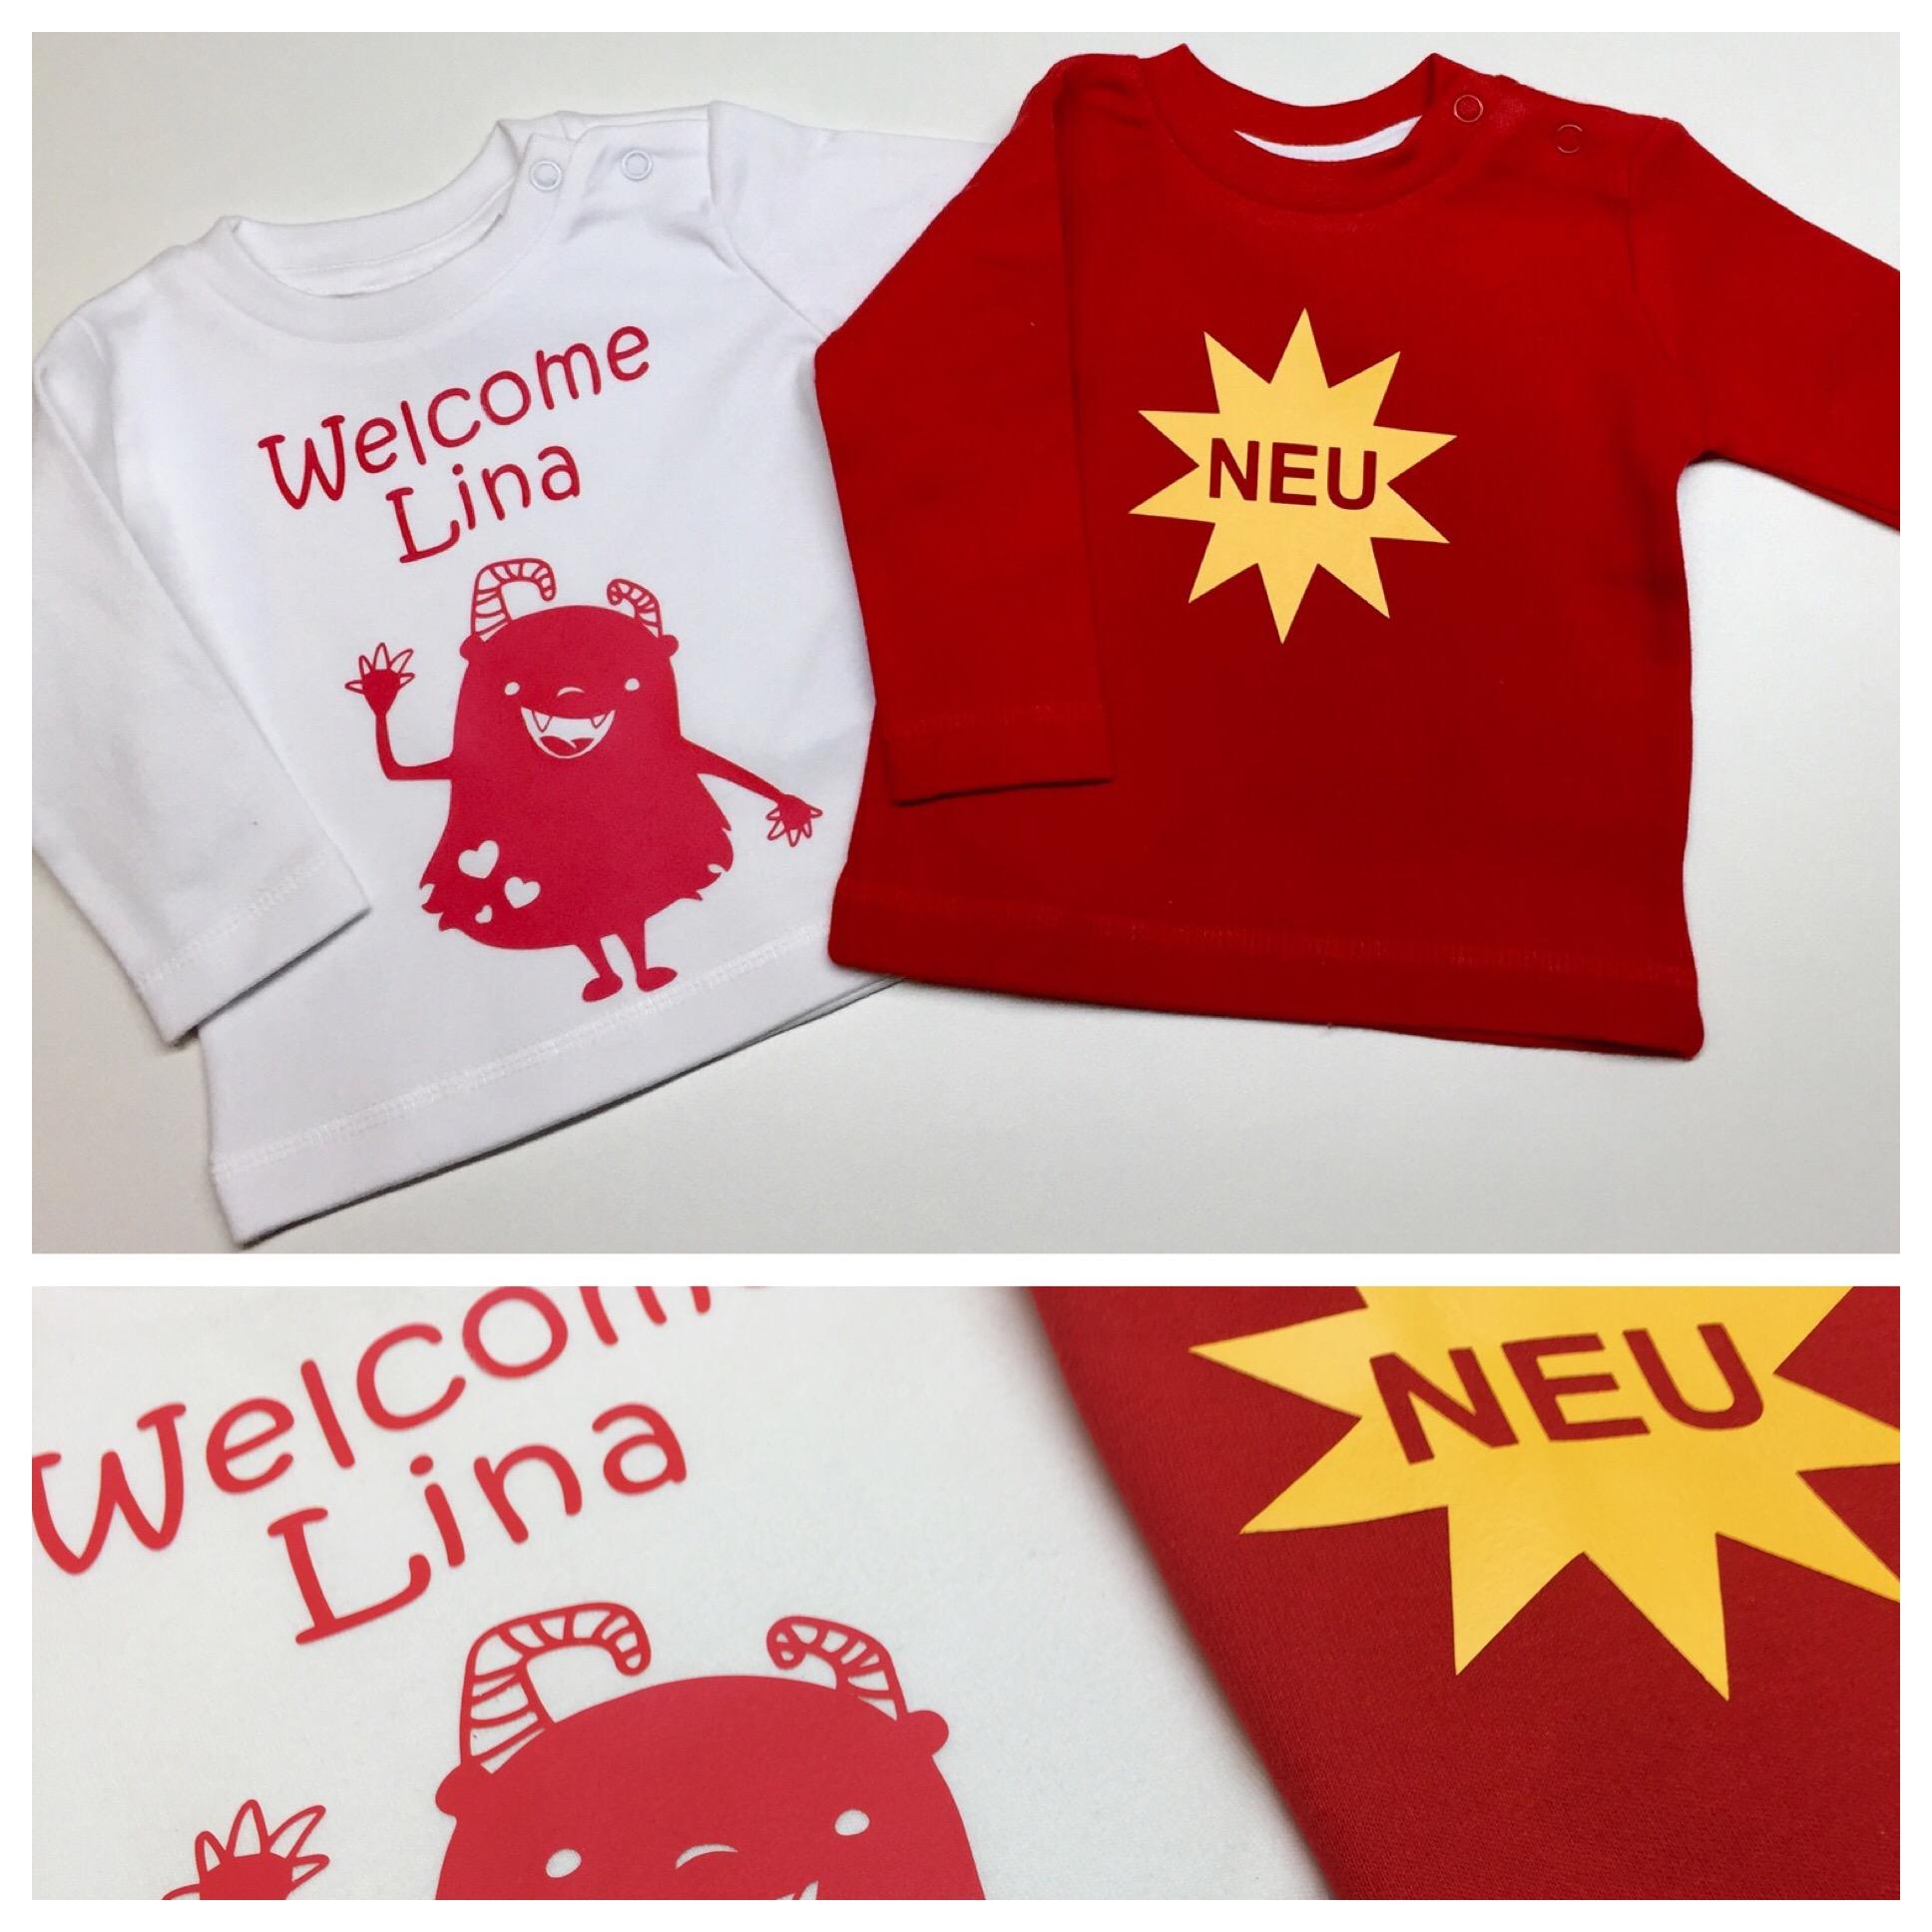 Geburtsgeschenk, Wilkommen, Welcome, Neu, plotten, geplottet, personalisiert, Shirt, Shirtdesign, Plotterliebe